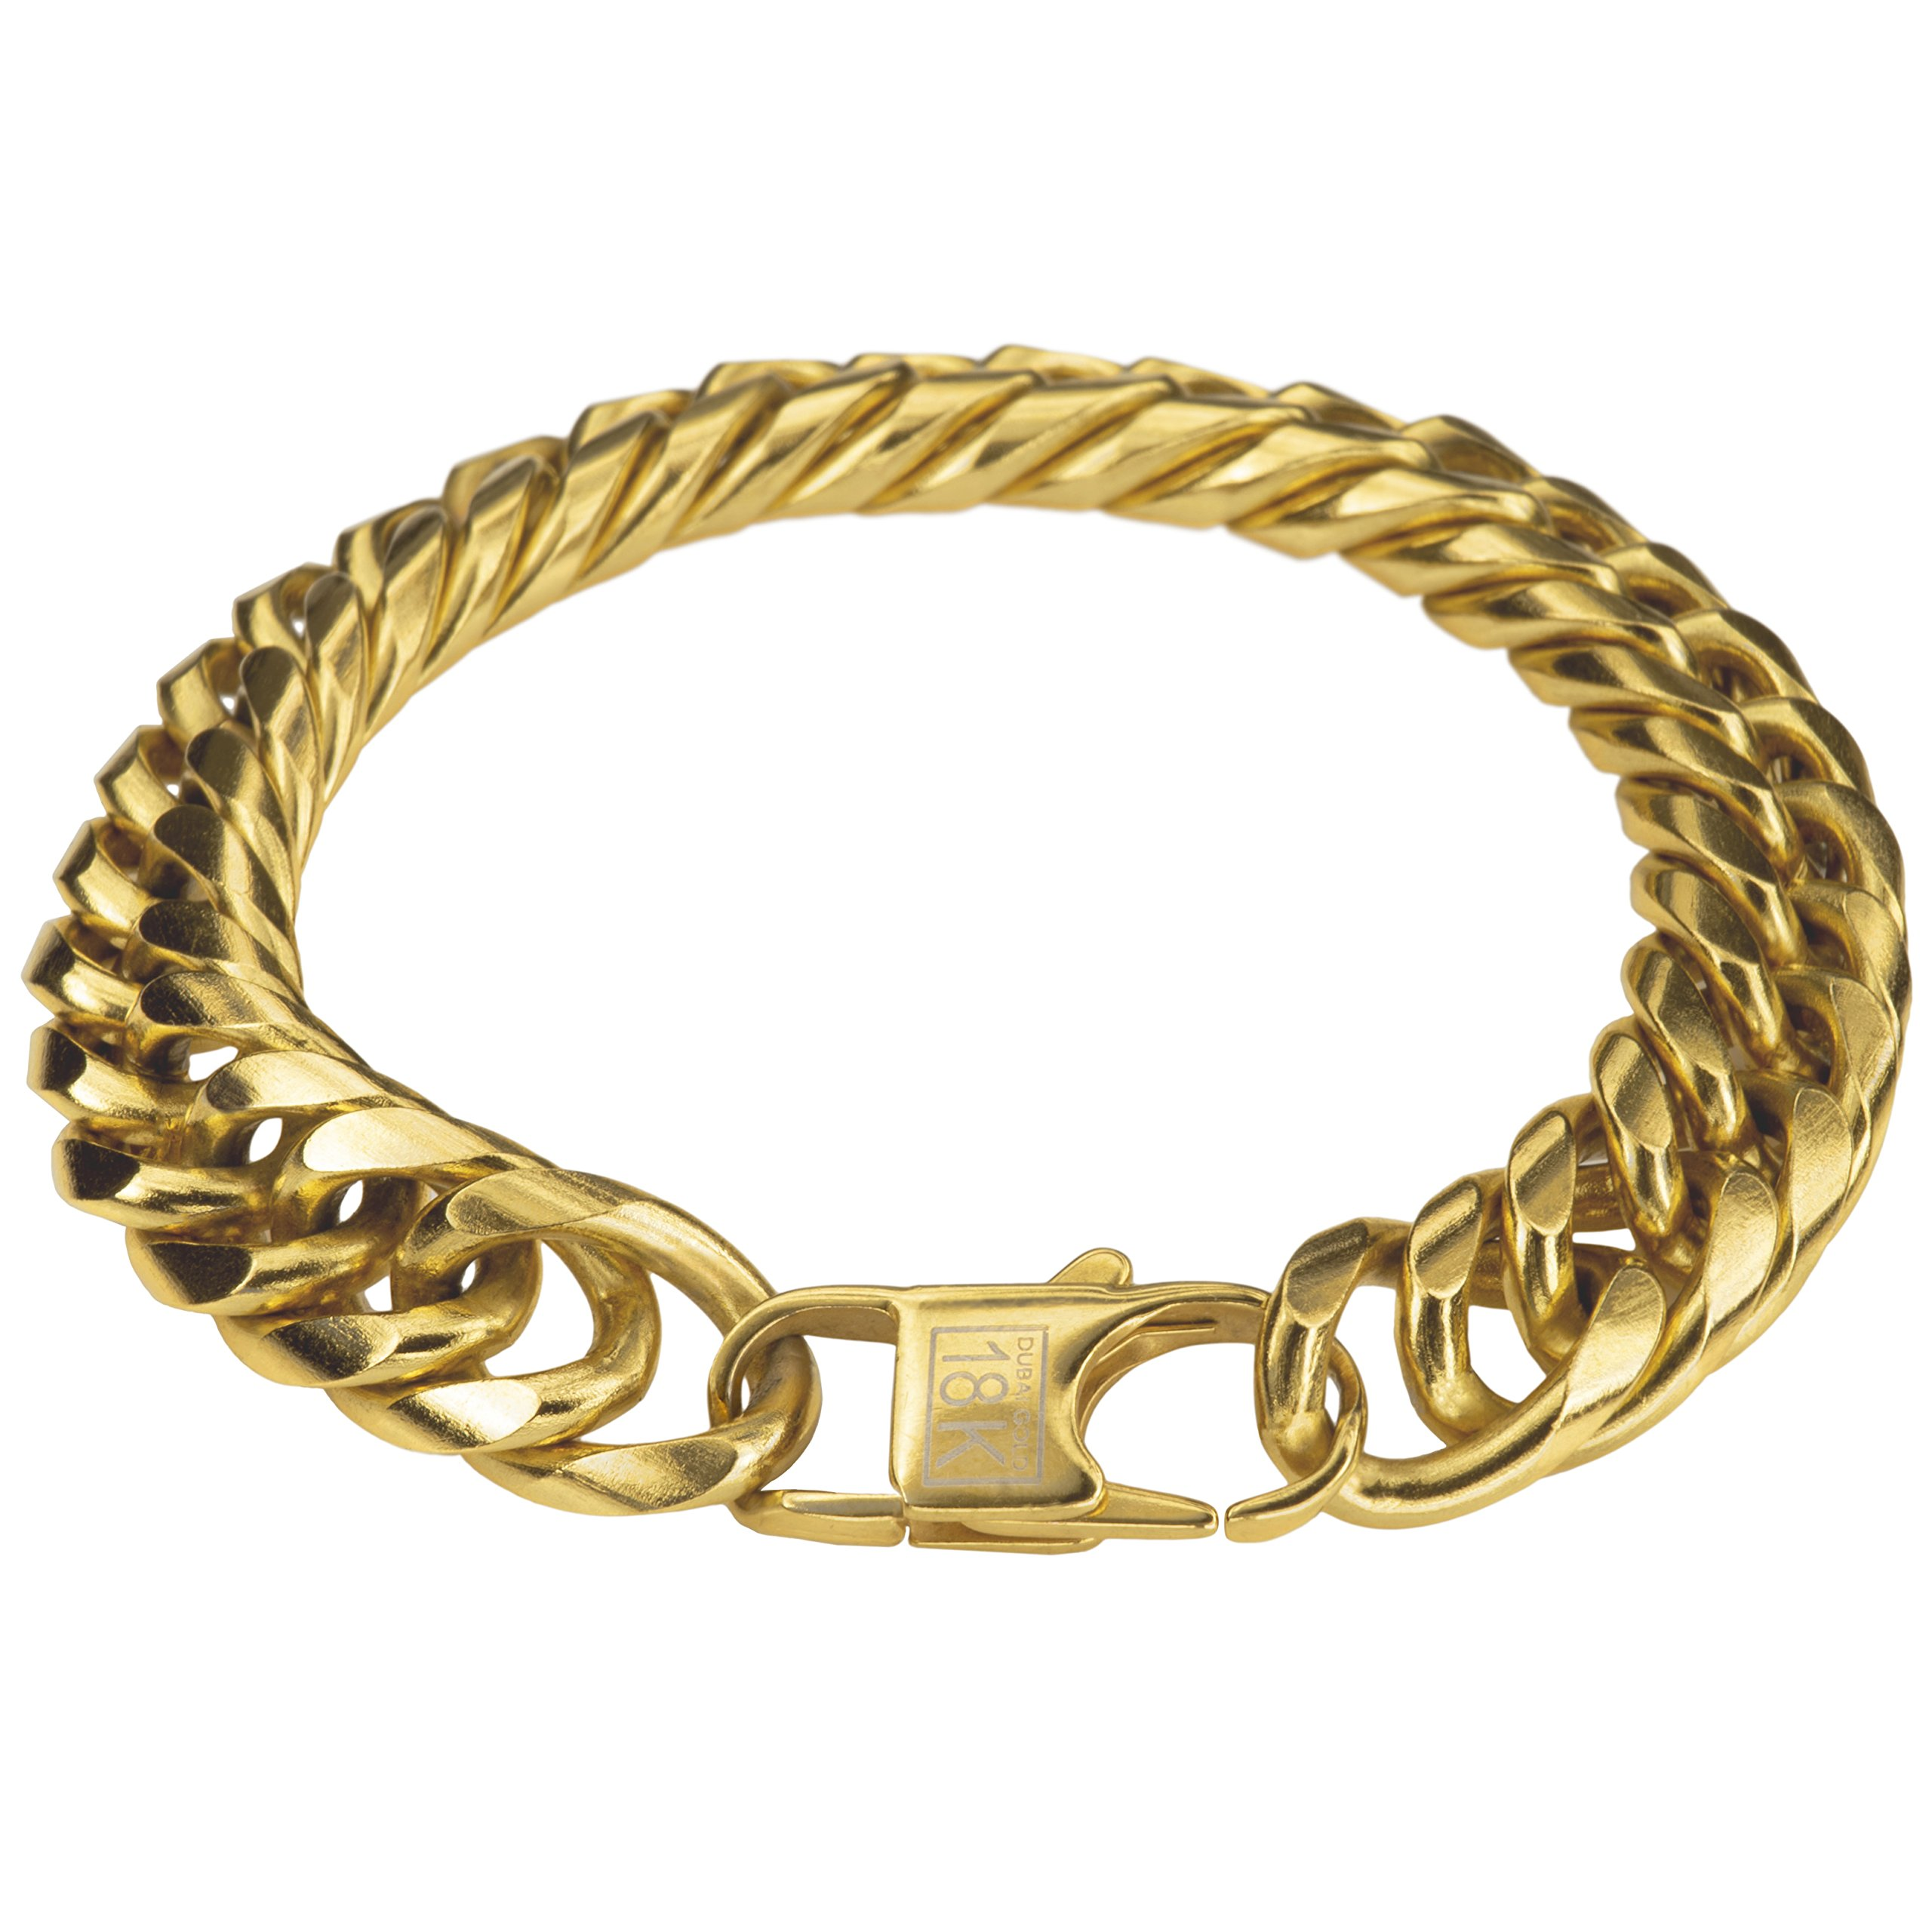 Thick 18k Gold Bracelet Cuban Link Chain For Men + Leatherette Gift Bag